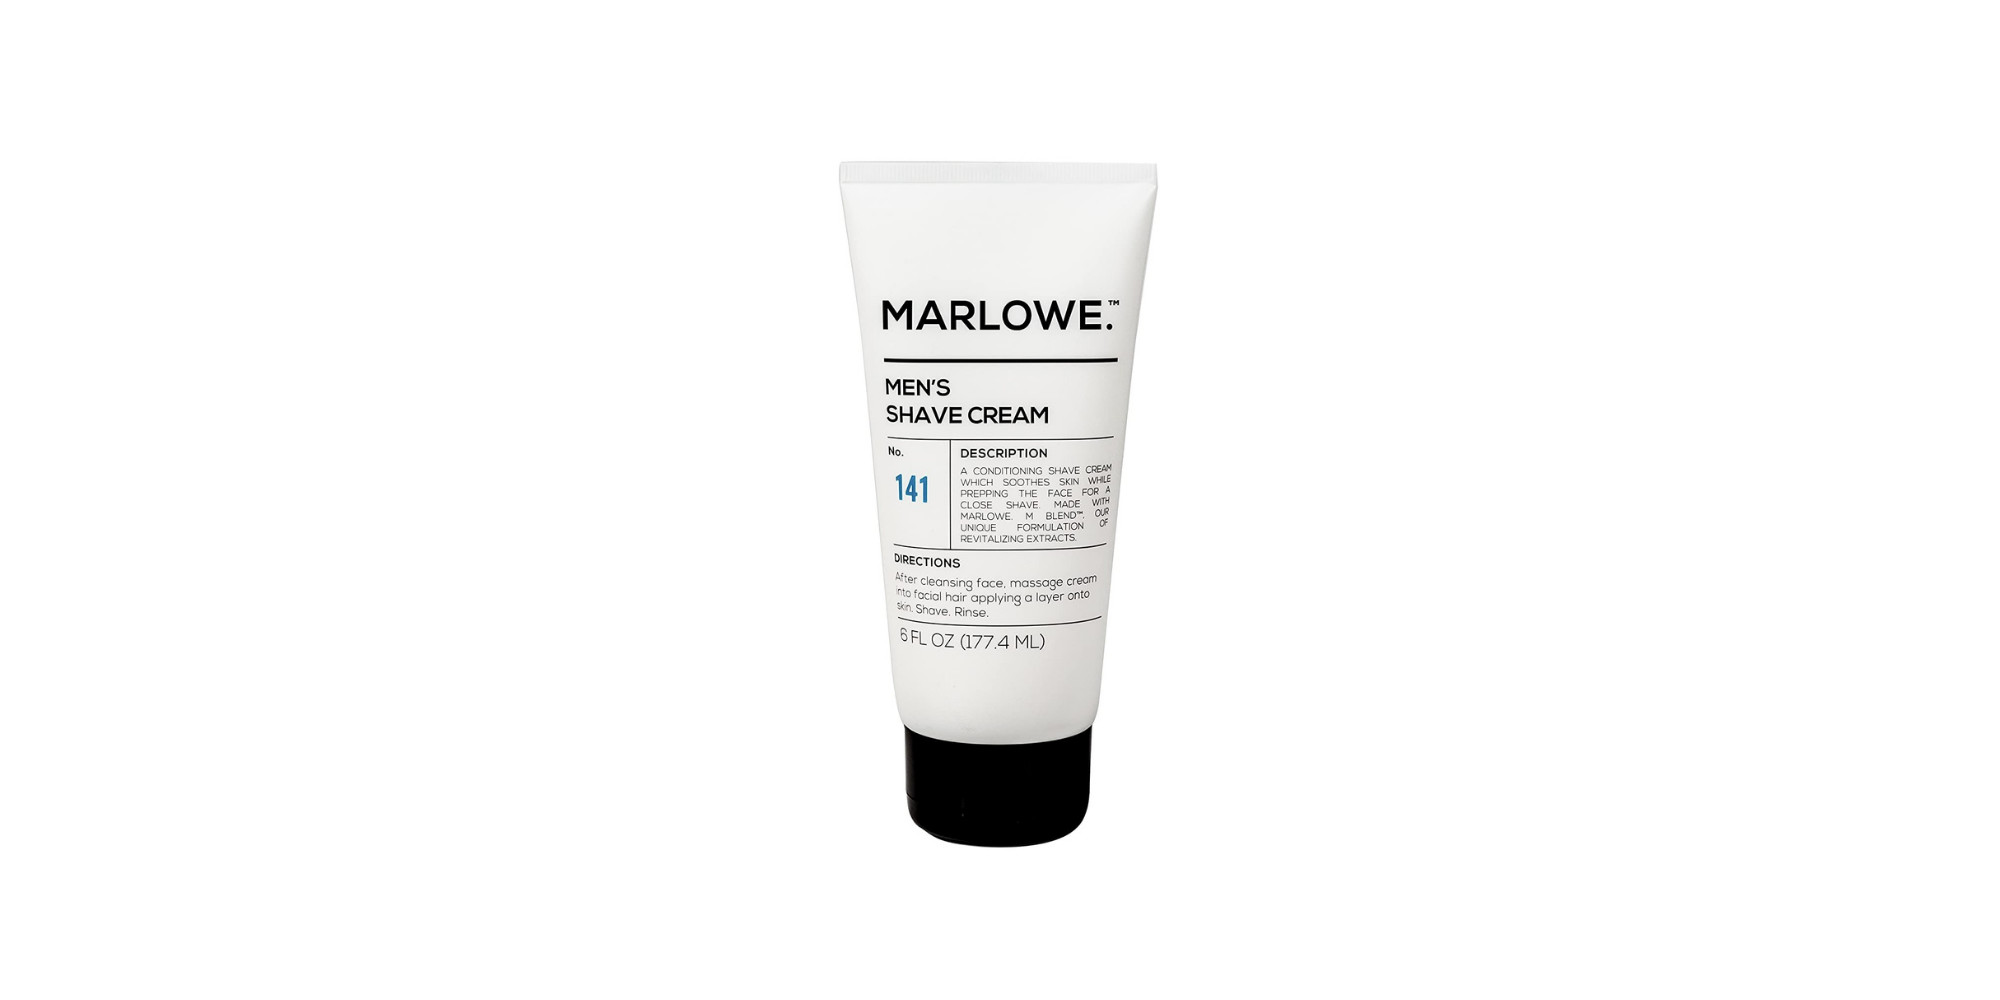 MARLOWE. Shave Cream